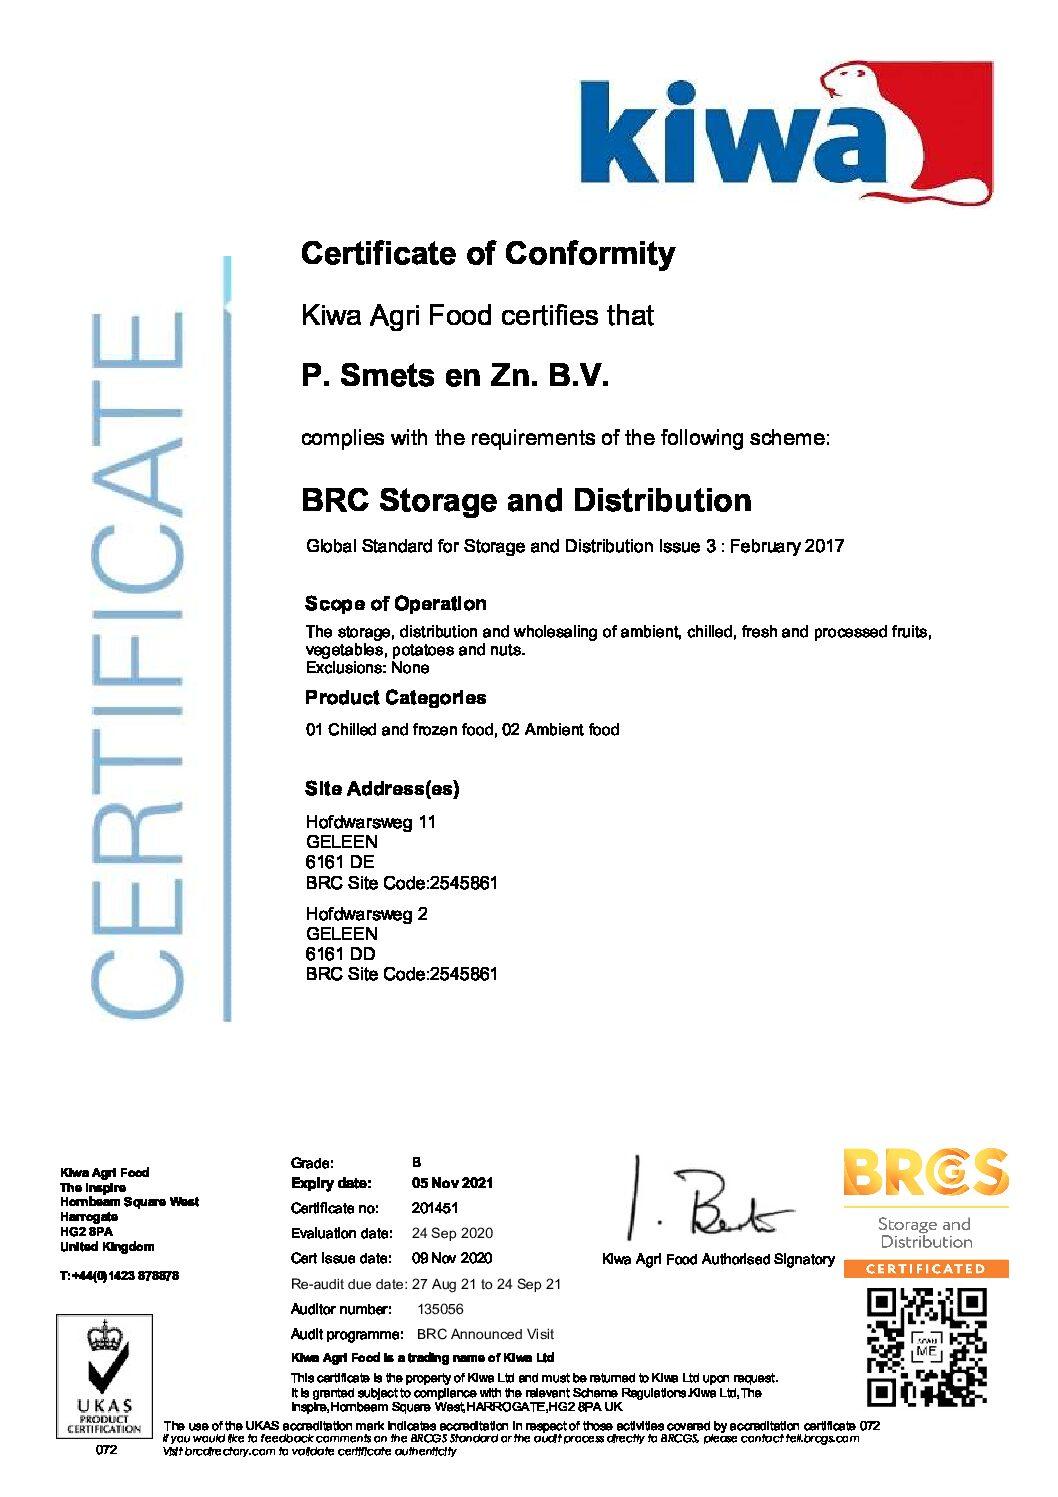 P. Smets en Zn. B.V. BRC Storage and Distribution Certificate 2020